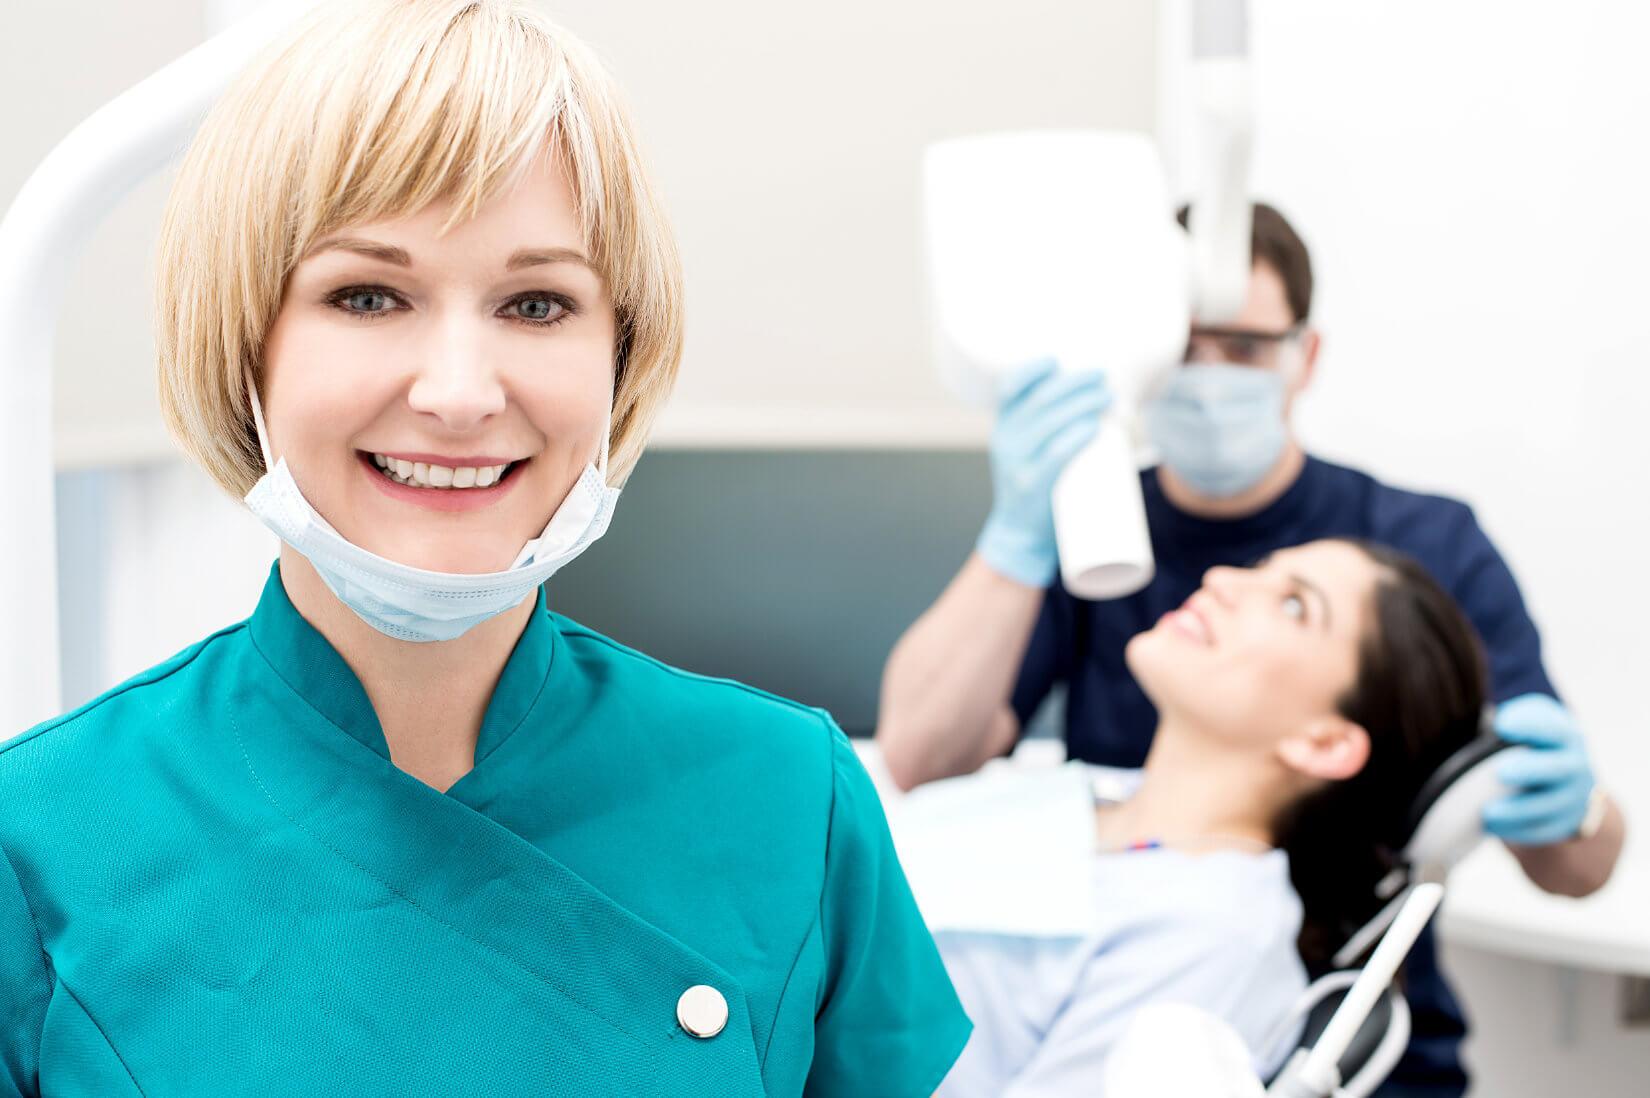 Dental cpr training online via e-learning, suitable for dentists, hygienists, dental nurses